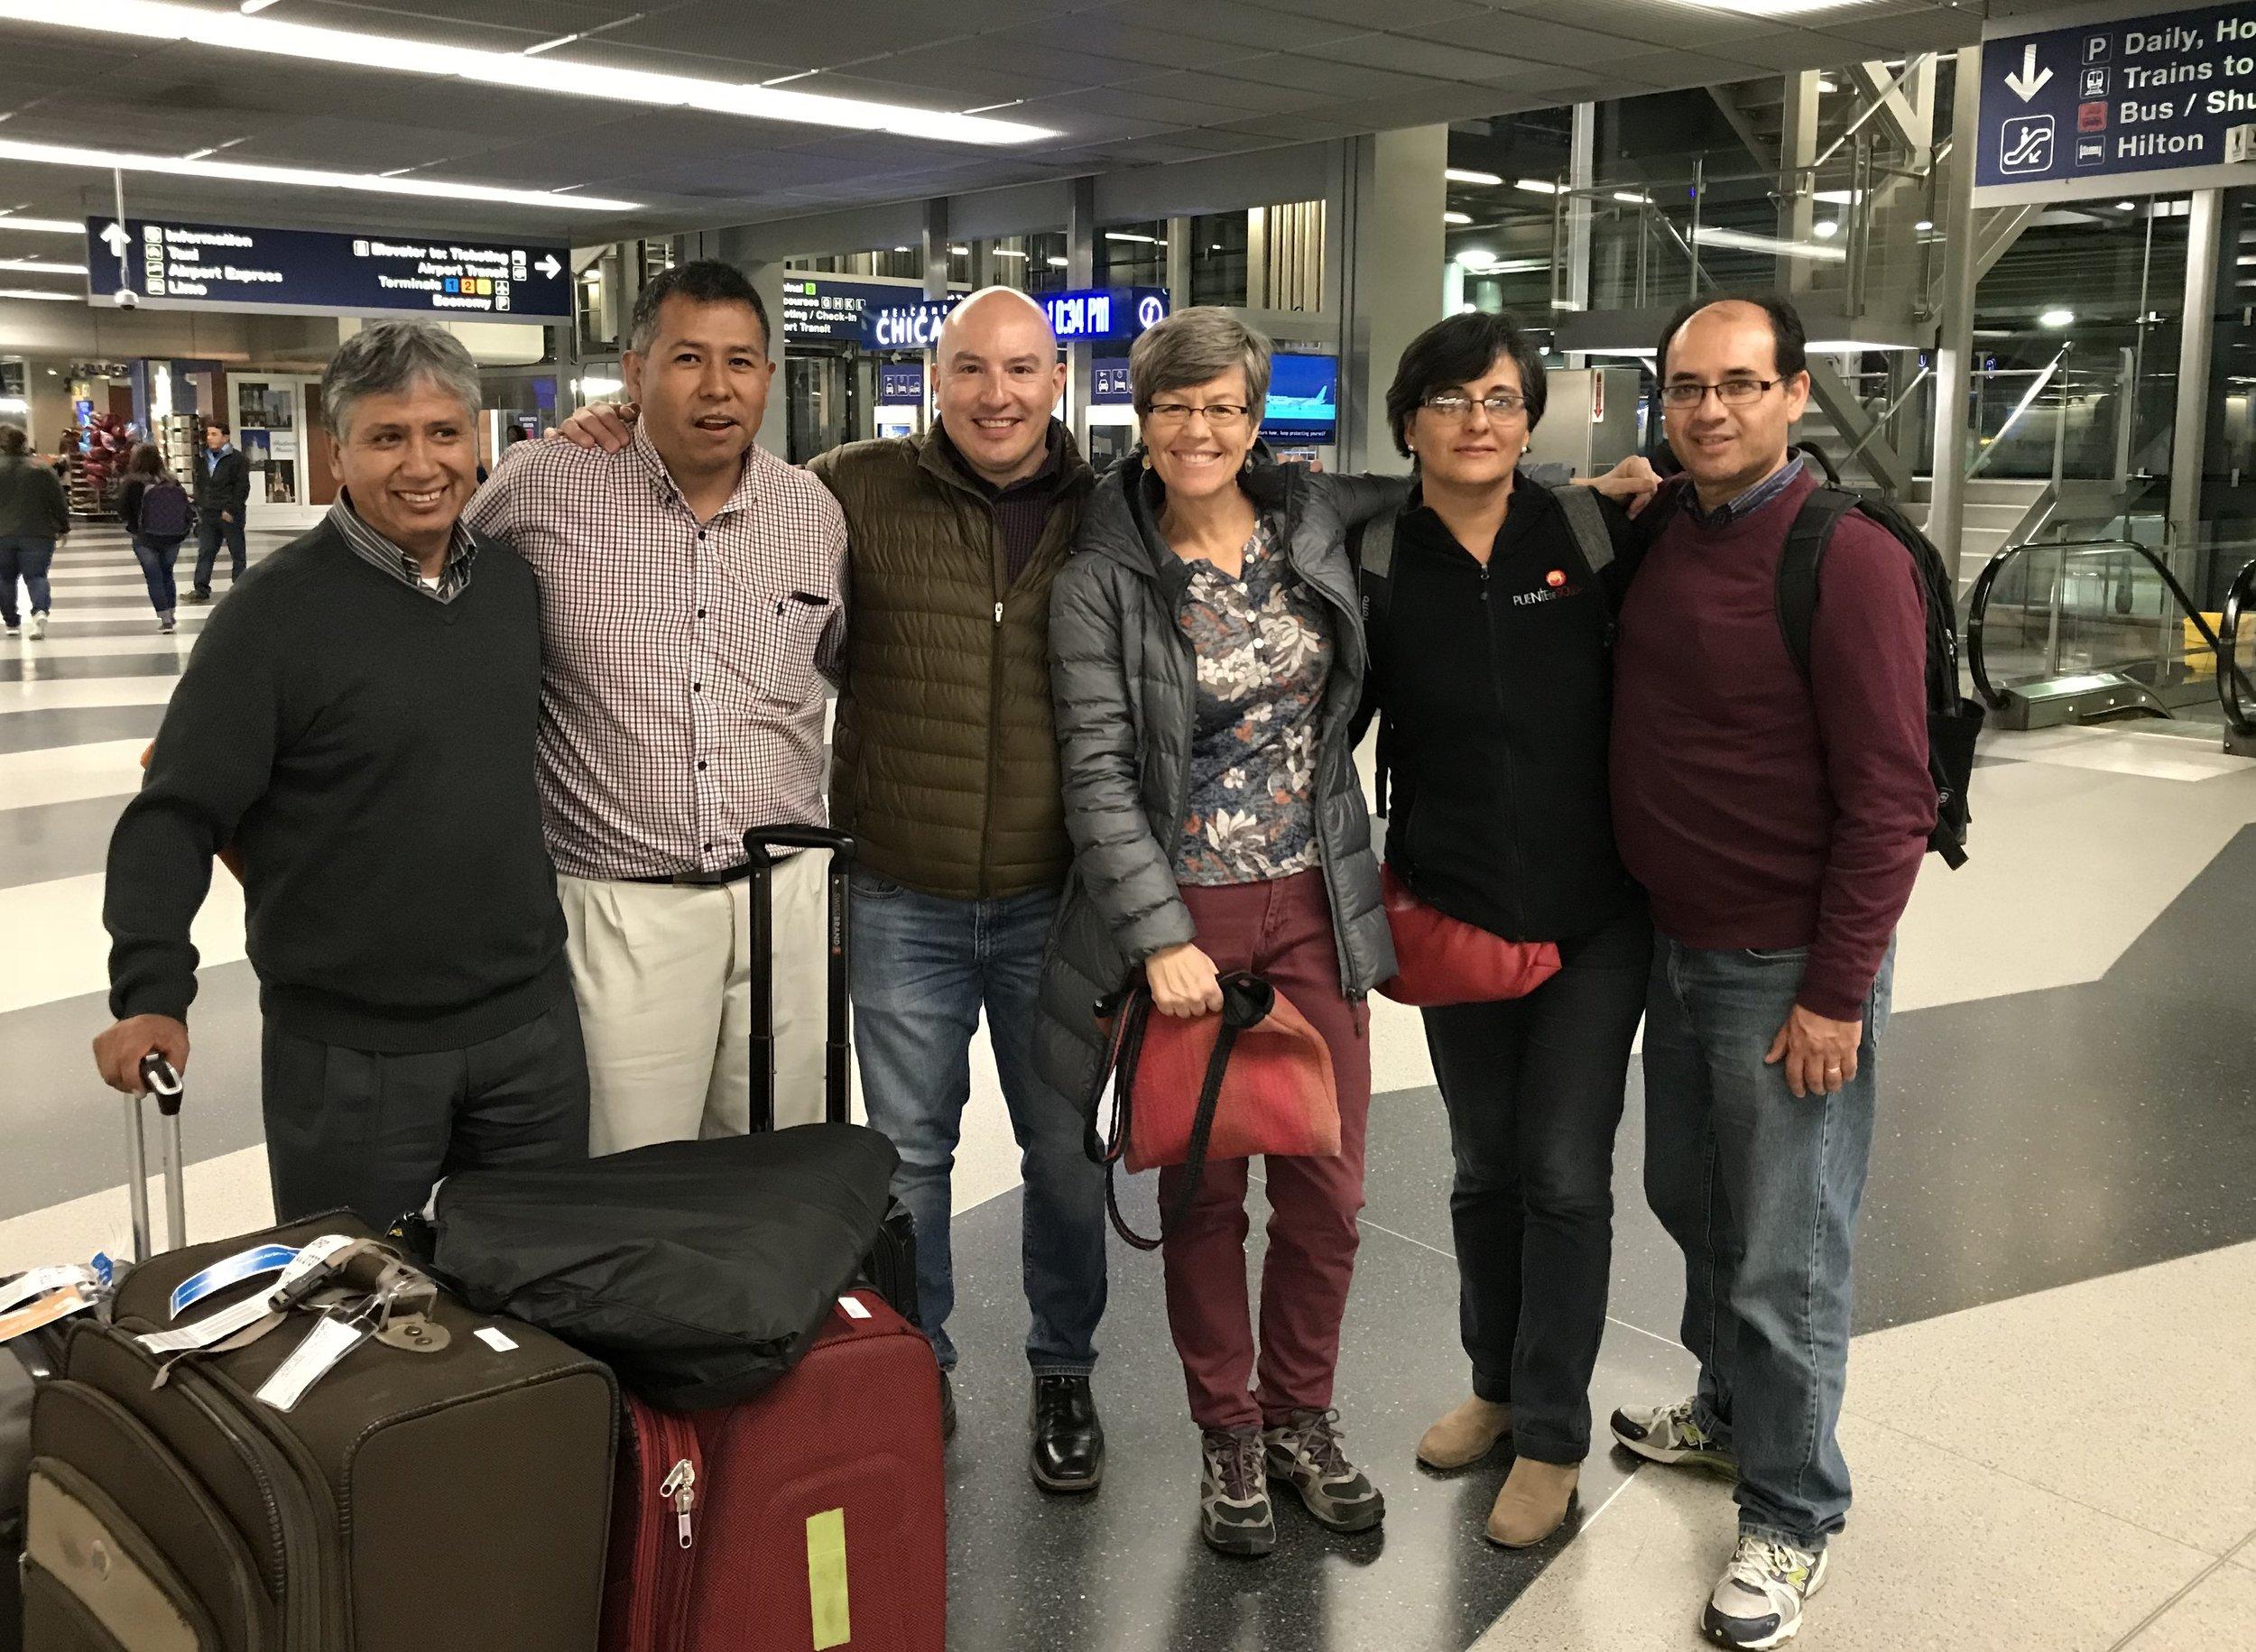 Arriving at O'Hare Airport (from left): Jaime Vallejos, Johnny Camacho, Marco Fernandez, Ann Rhomberg, Patricia Vargas, Carlos Decker